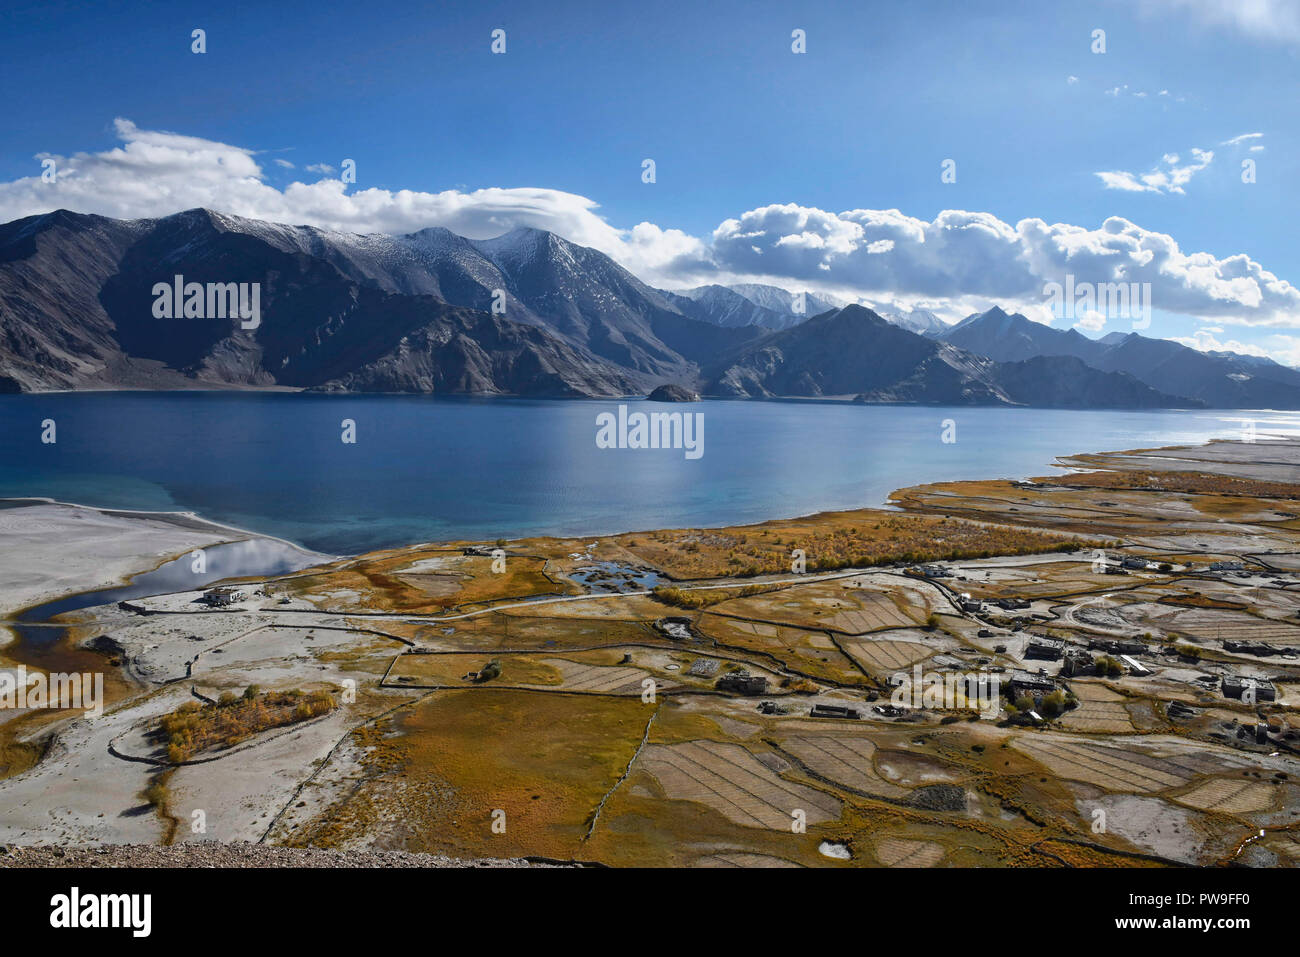 Meerak village and Pangong Lake in autumn color, Ladakh, India - Stock Image